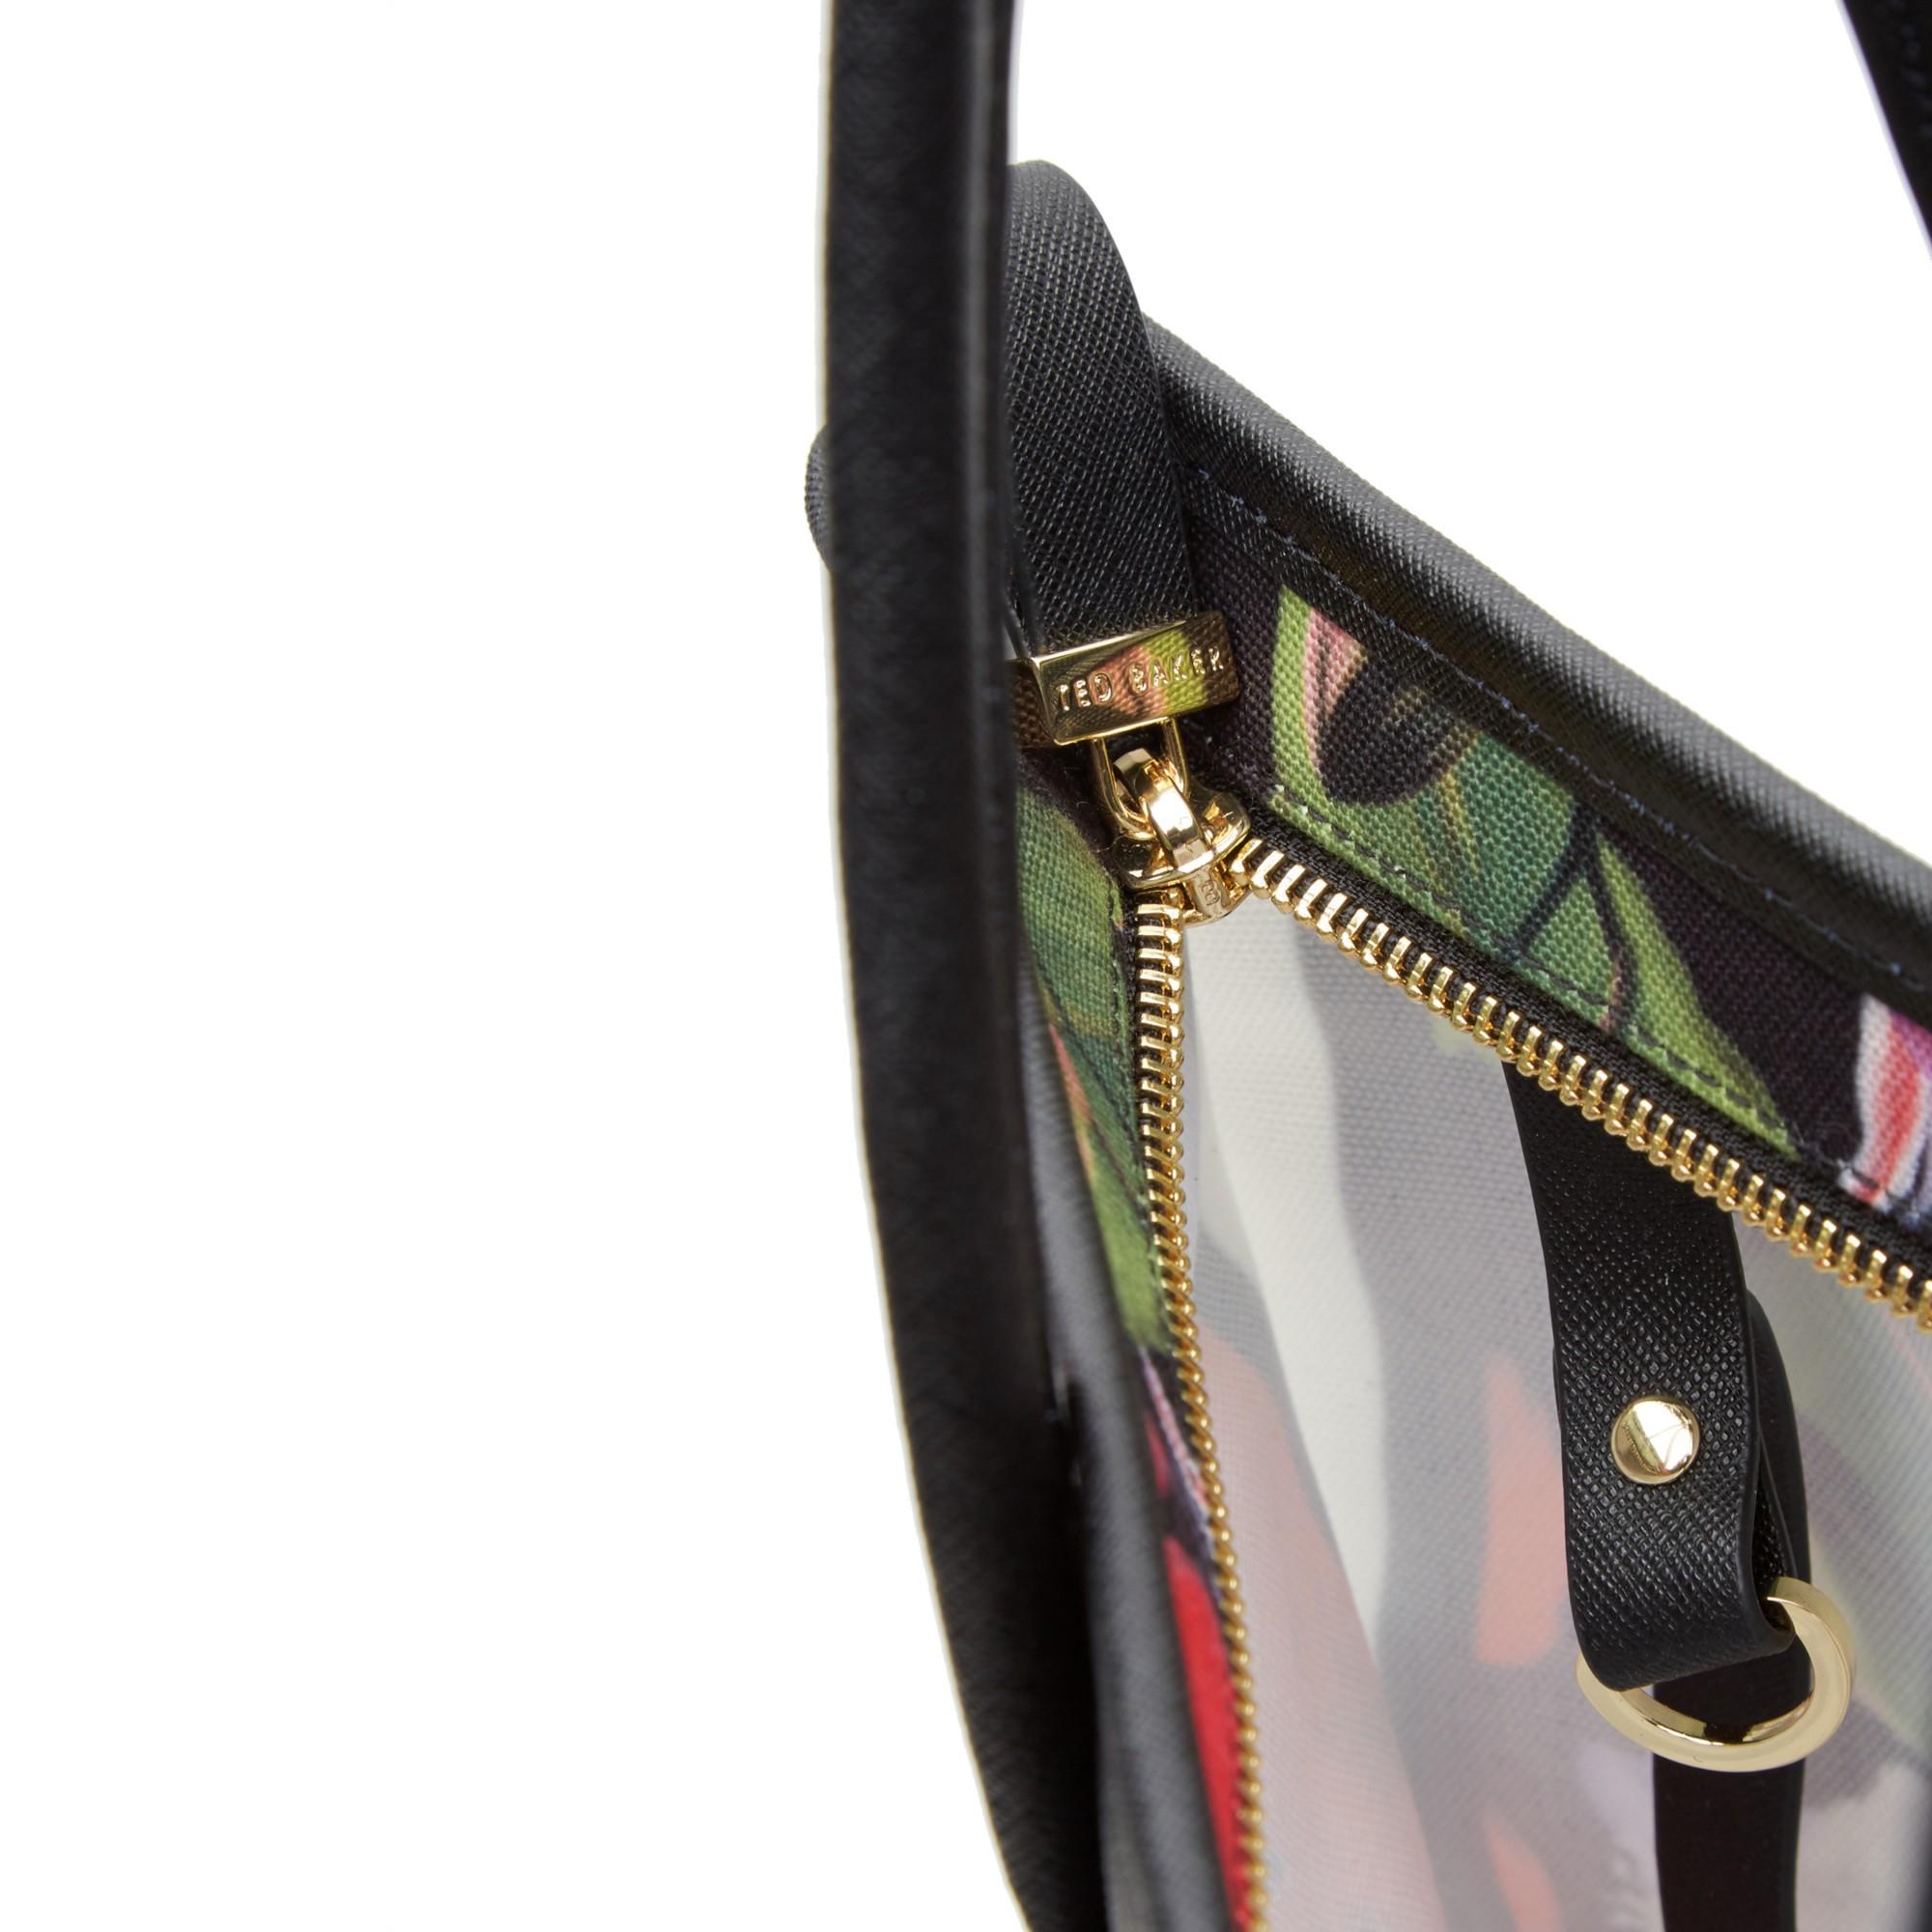 Ted Baker Synthetic Hanita Forget Me Not Foldaway Tote Bag in Black